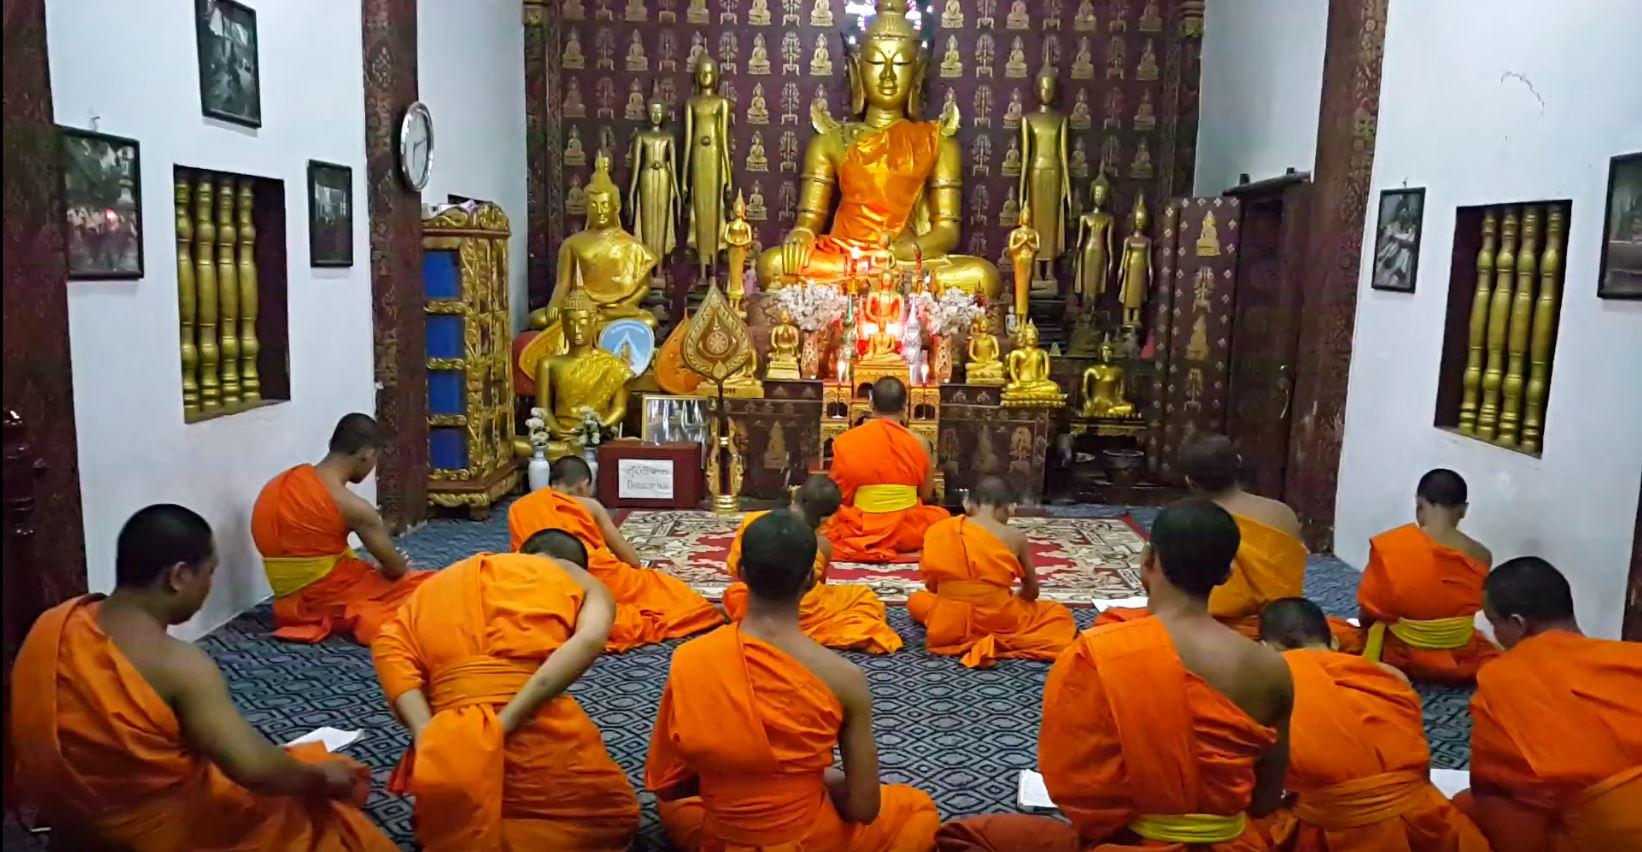 Budist Okulu